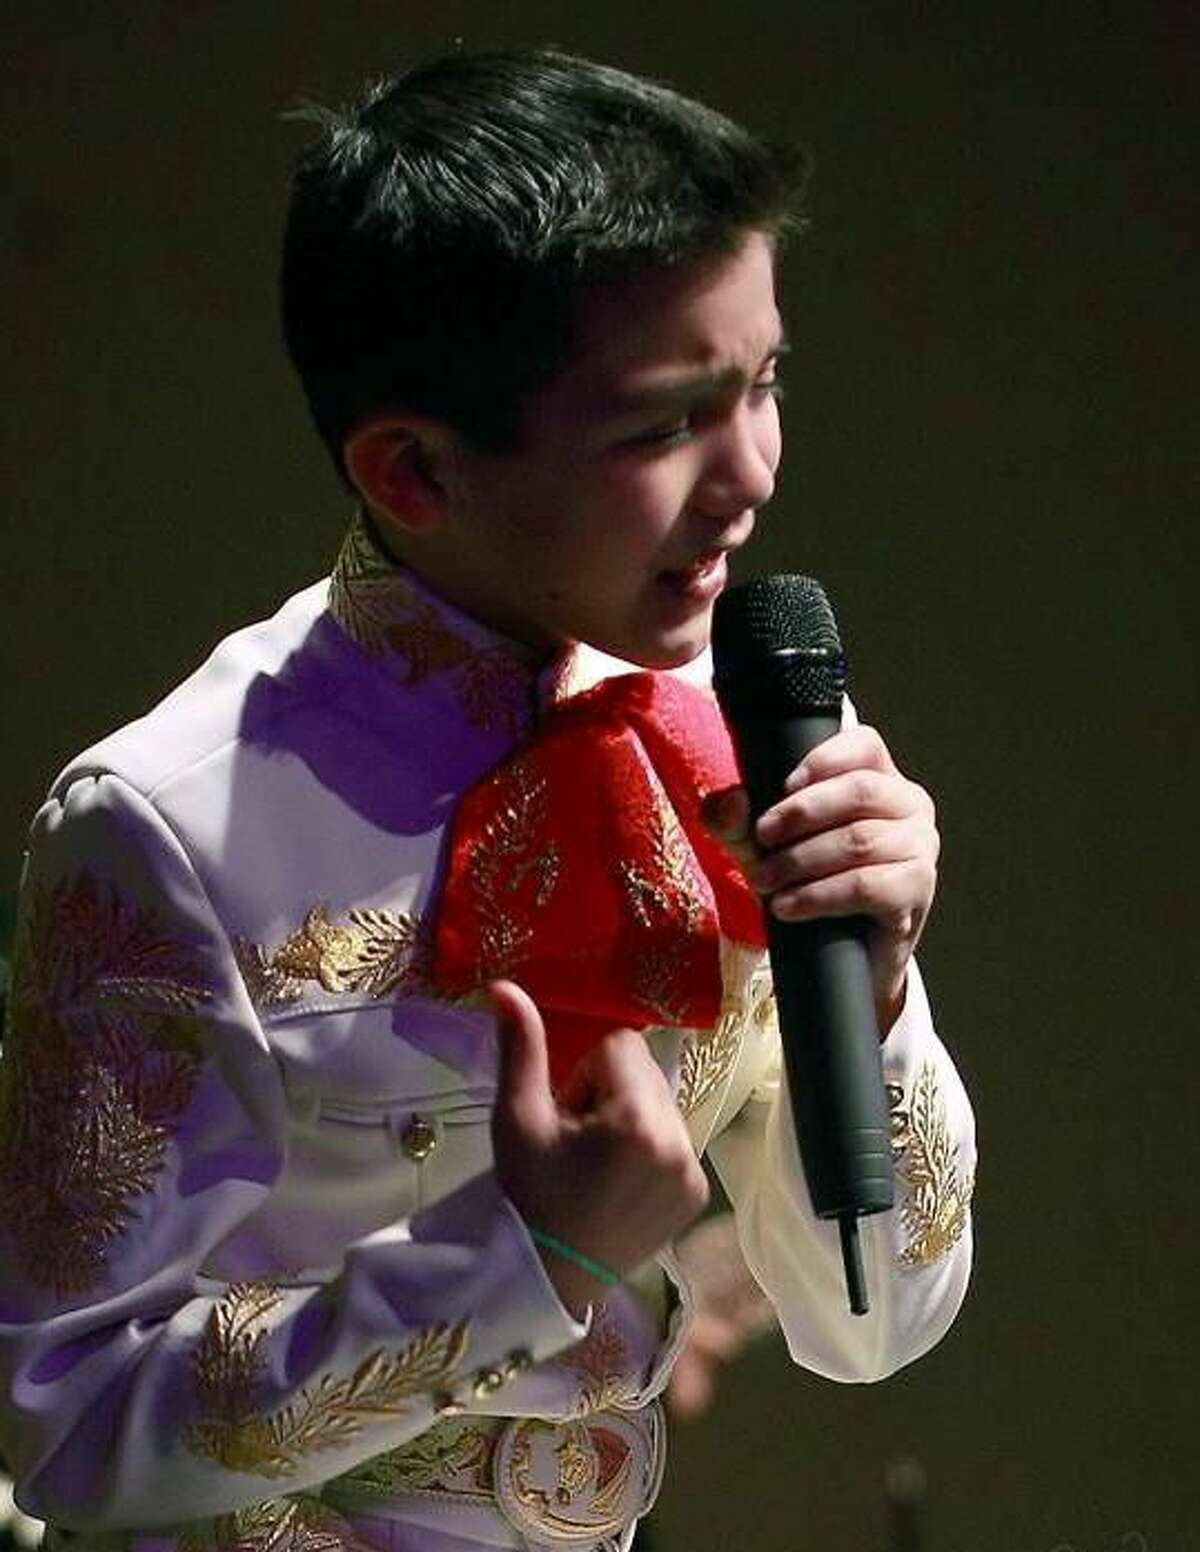 In this undated publicity photo released courtesy of Mariachi Spectacular de Albuquerque, 11-year-old San Antonio-born Sebastien de la Cruz is shown performing at one of his many concerts.